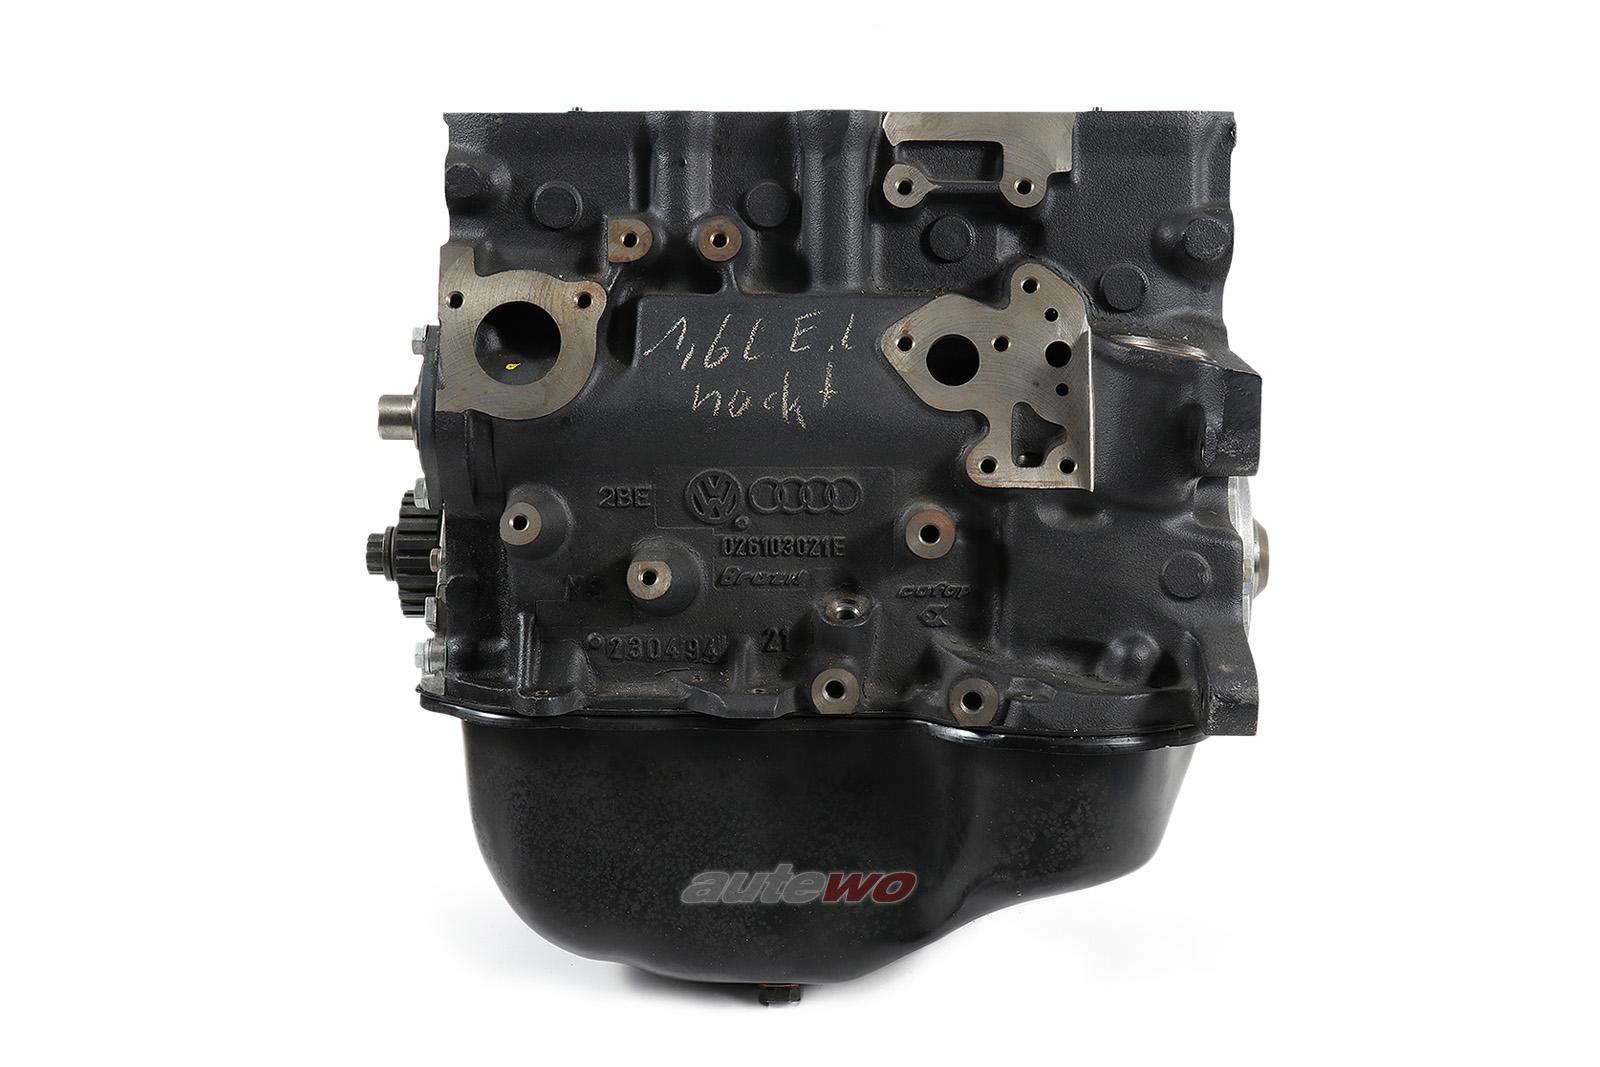 026100104C 026100103PX NEU Audi/VW 80 Typ 81/89 1.6l 4 Zylinder Teilmotor